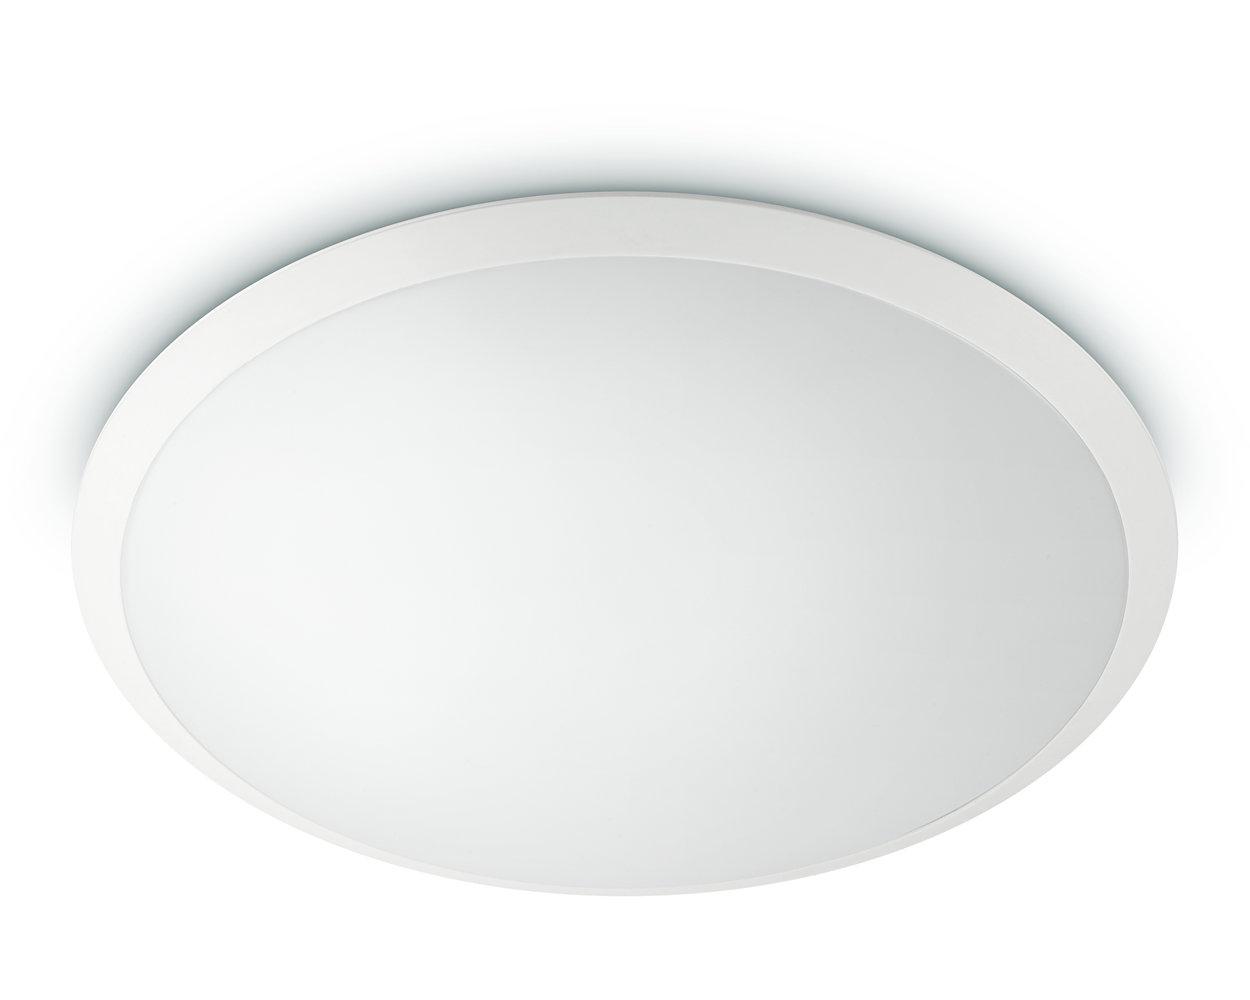 Iluminación de calidad para un hogar acogedor